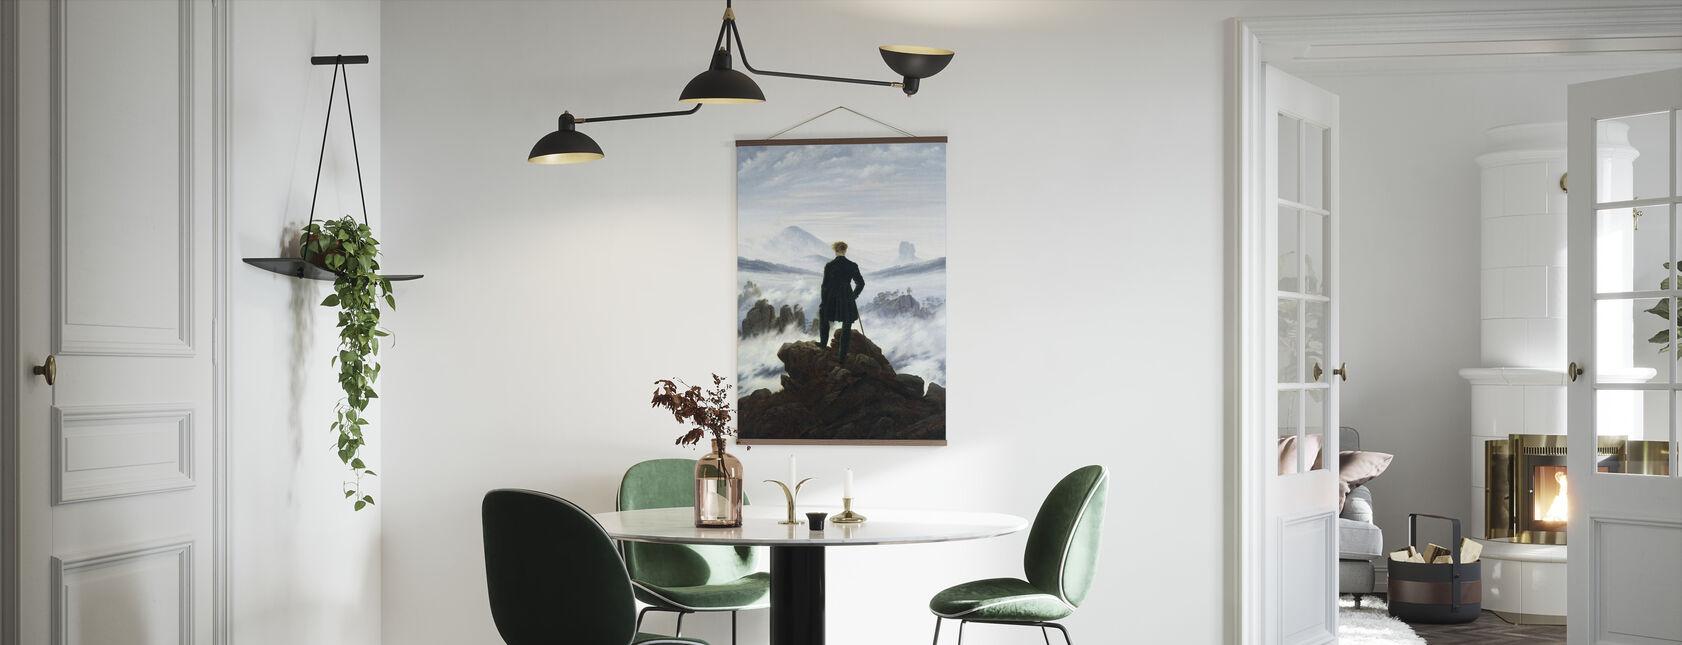 Wanderer boven de Mistenzee - Caspar Friedrich - Poster - Keuken